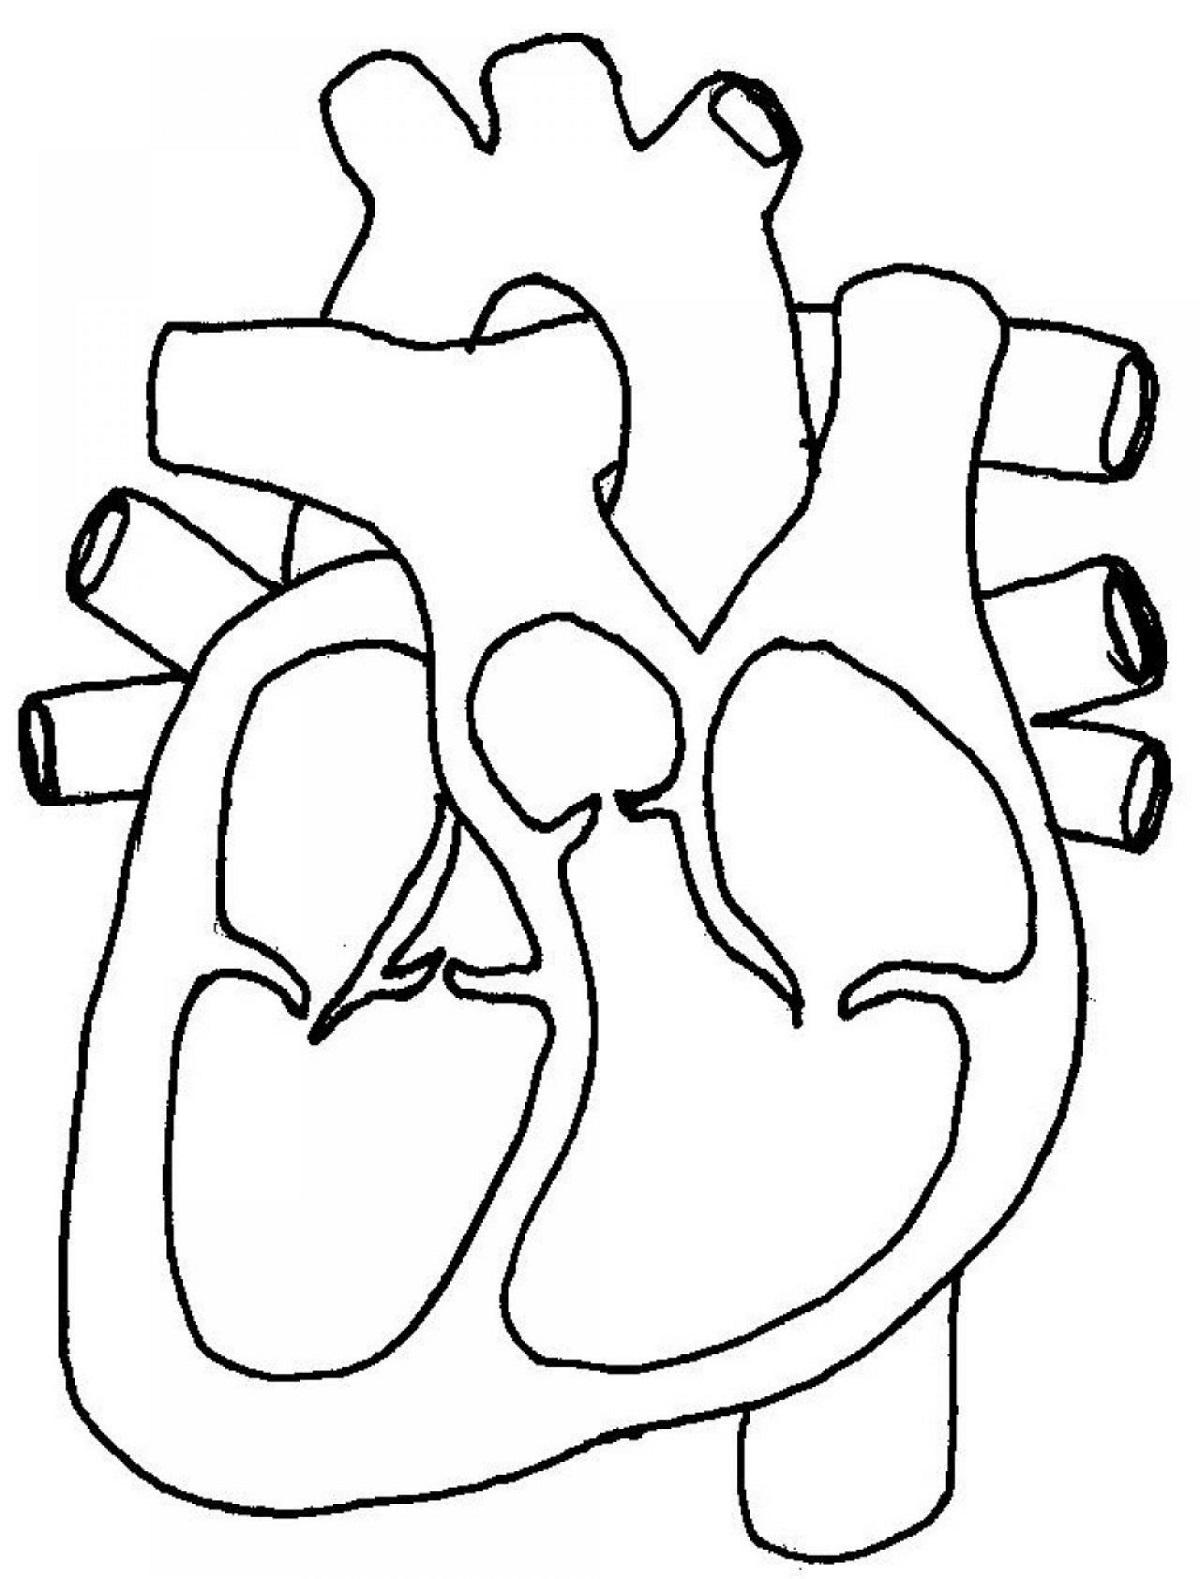 1200x1579 Printable Diagrams Of The Human Heart Diagram Site